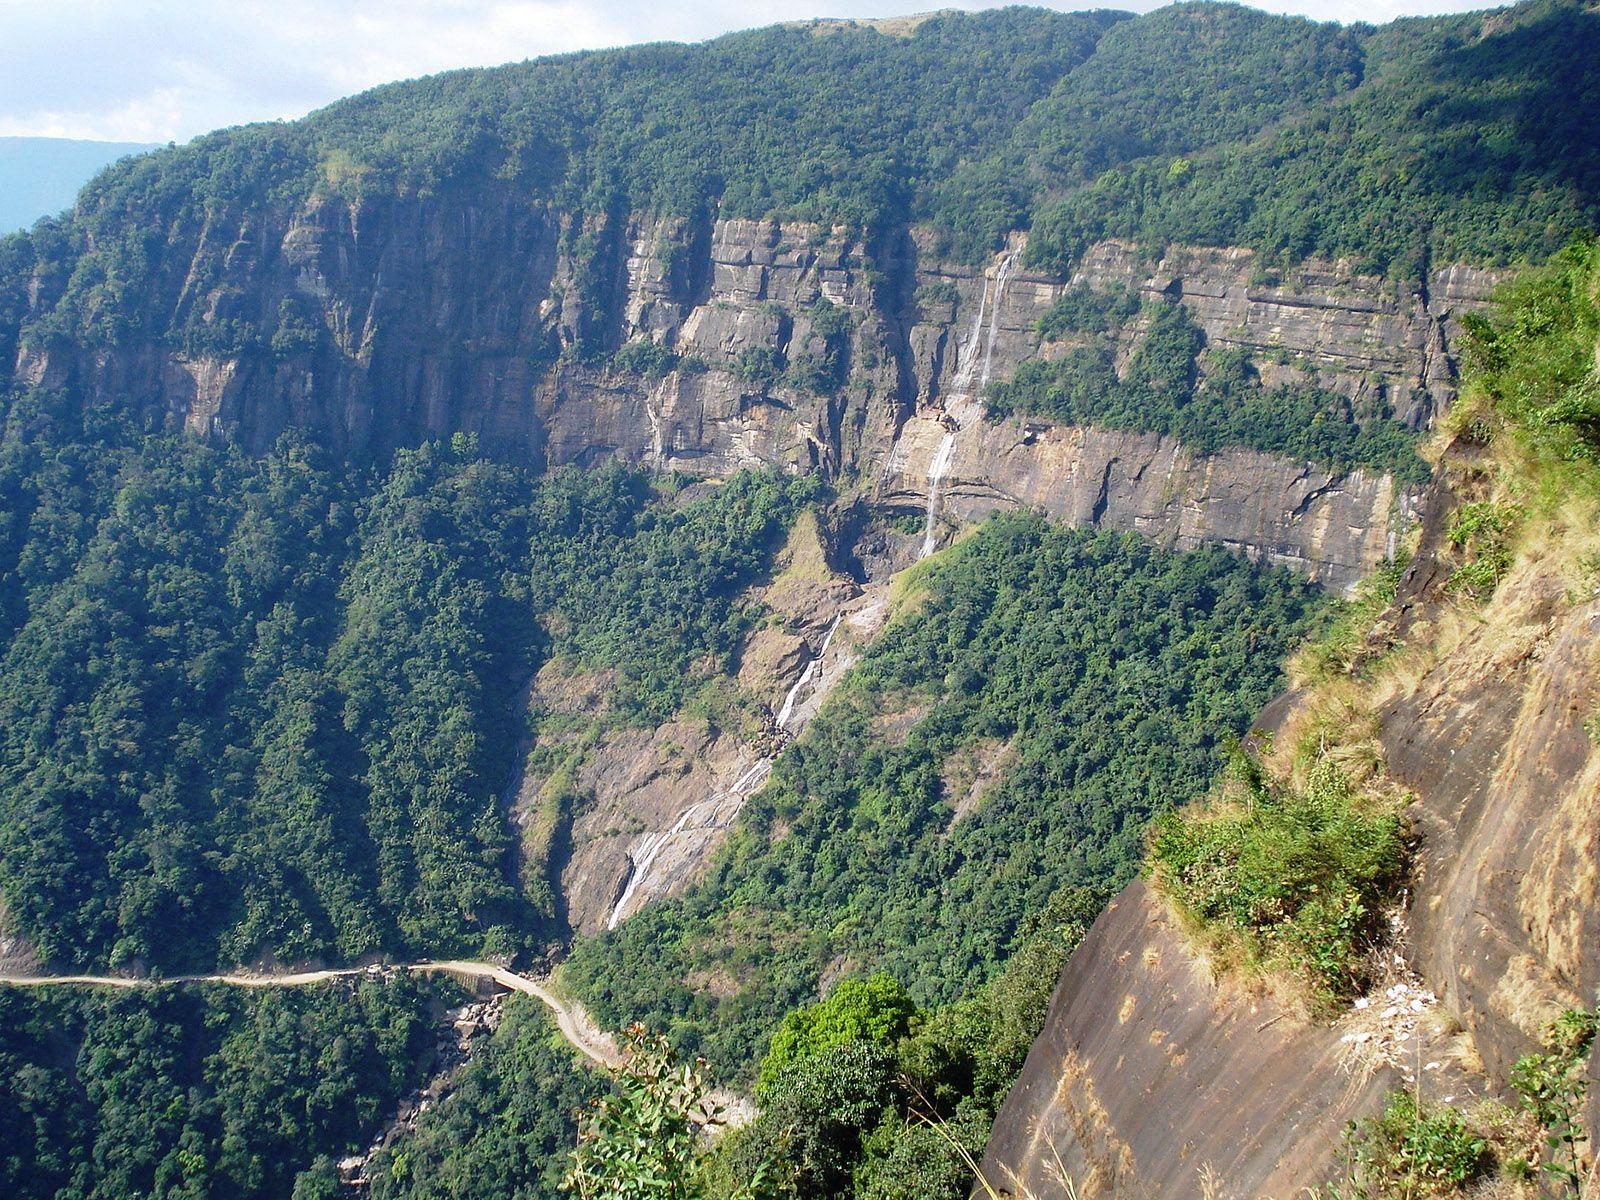 Водопад Нохкайликай издалека